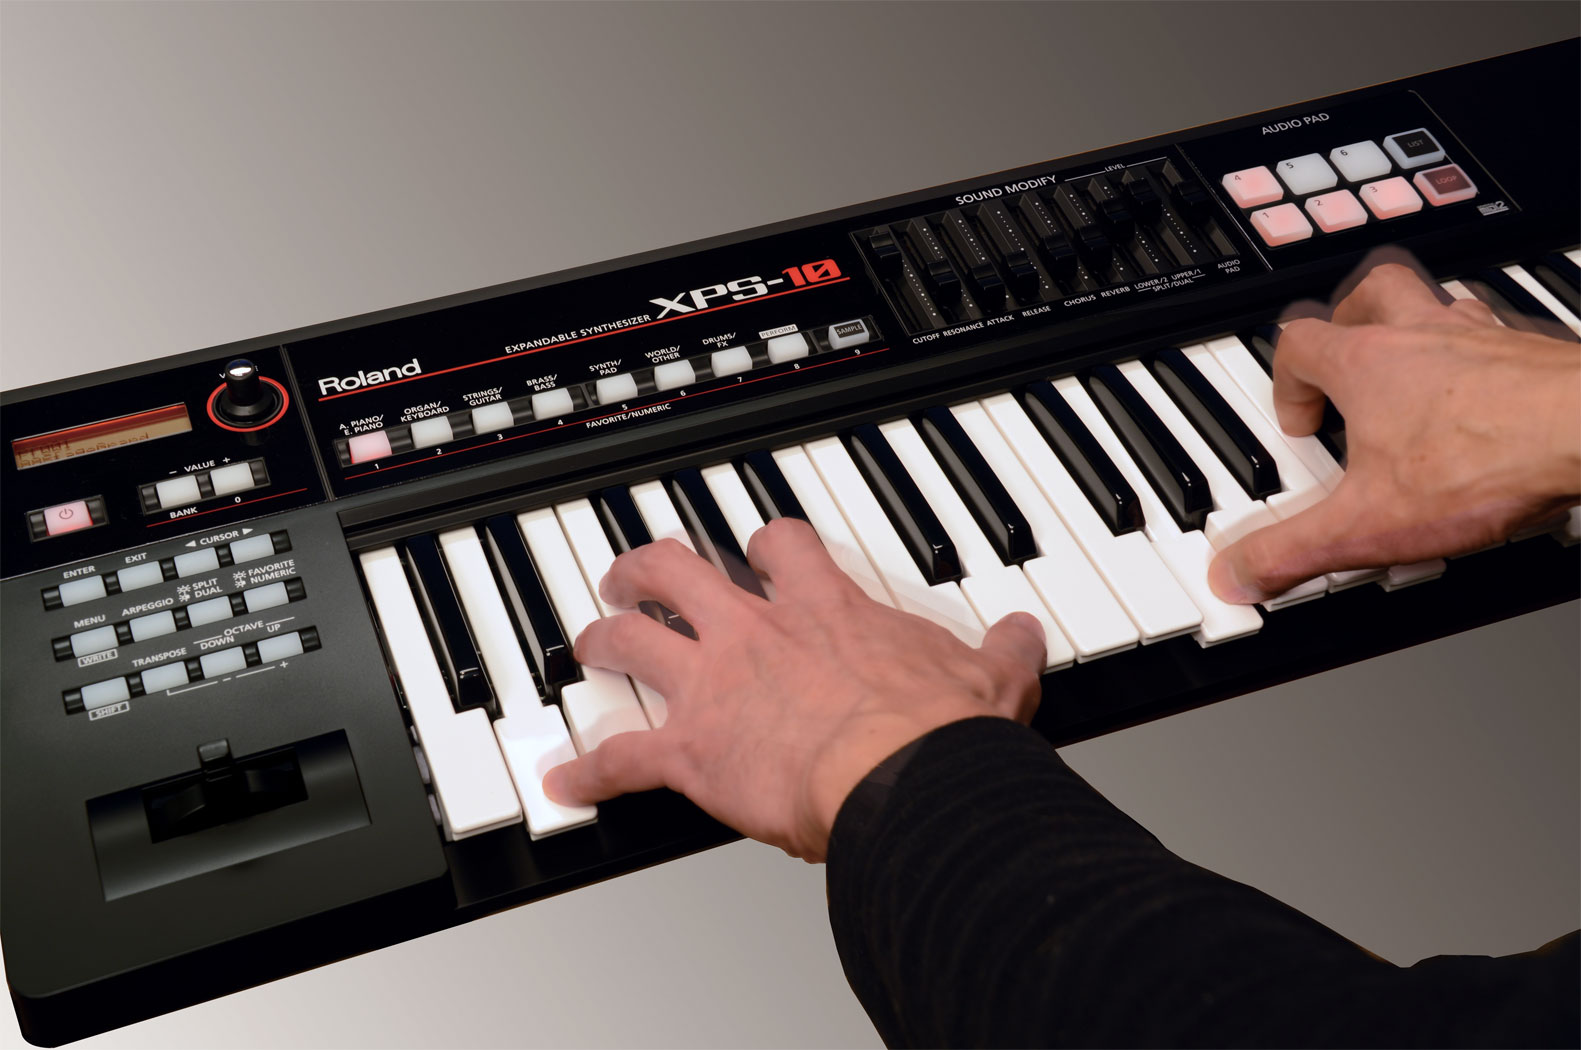 Roland - XPS-10 | Expandable Synthesizer